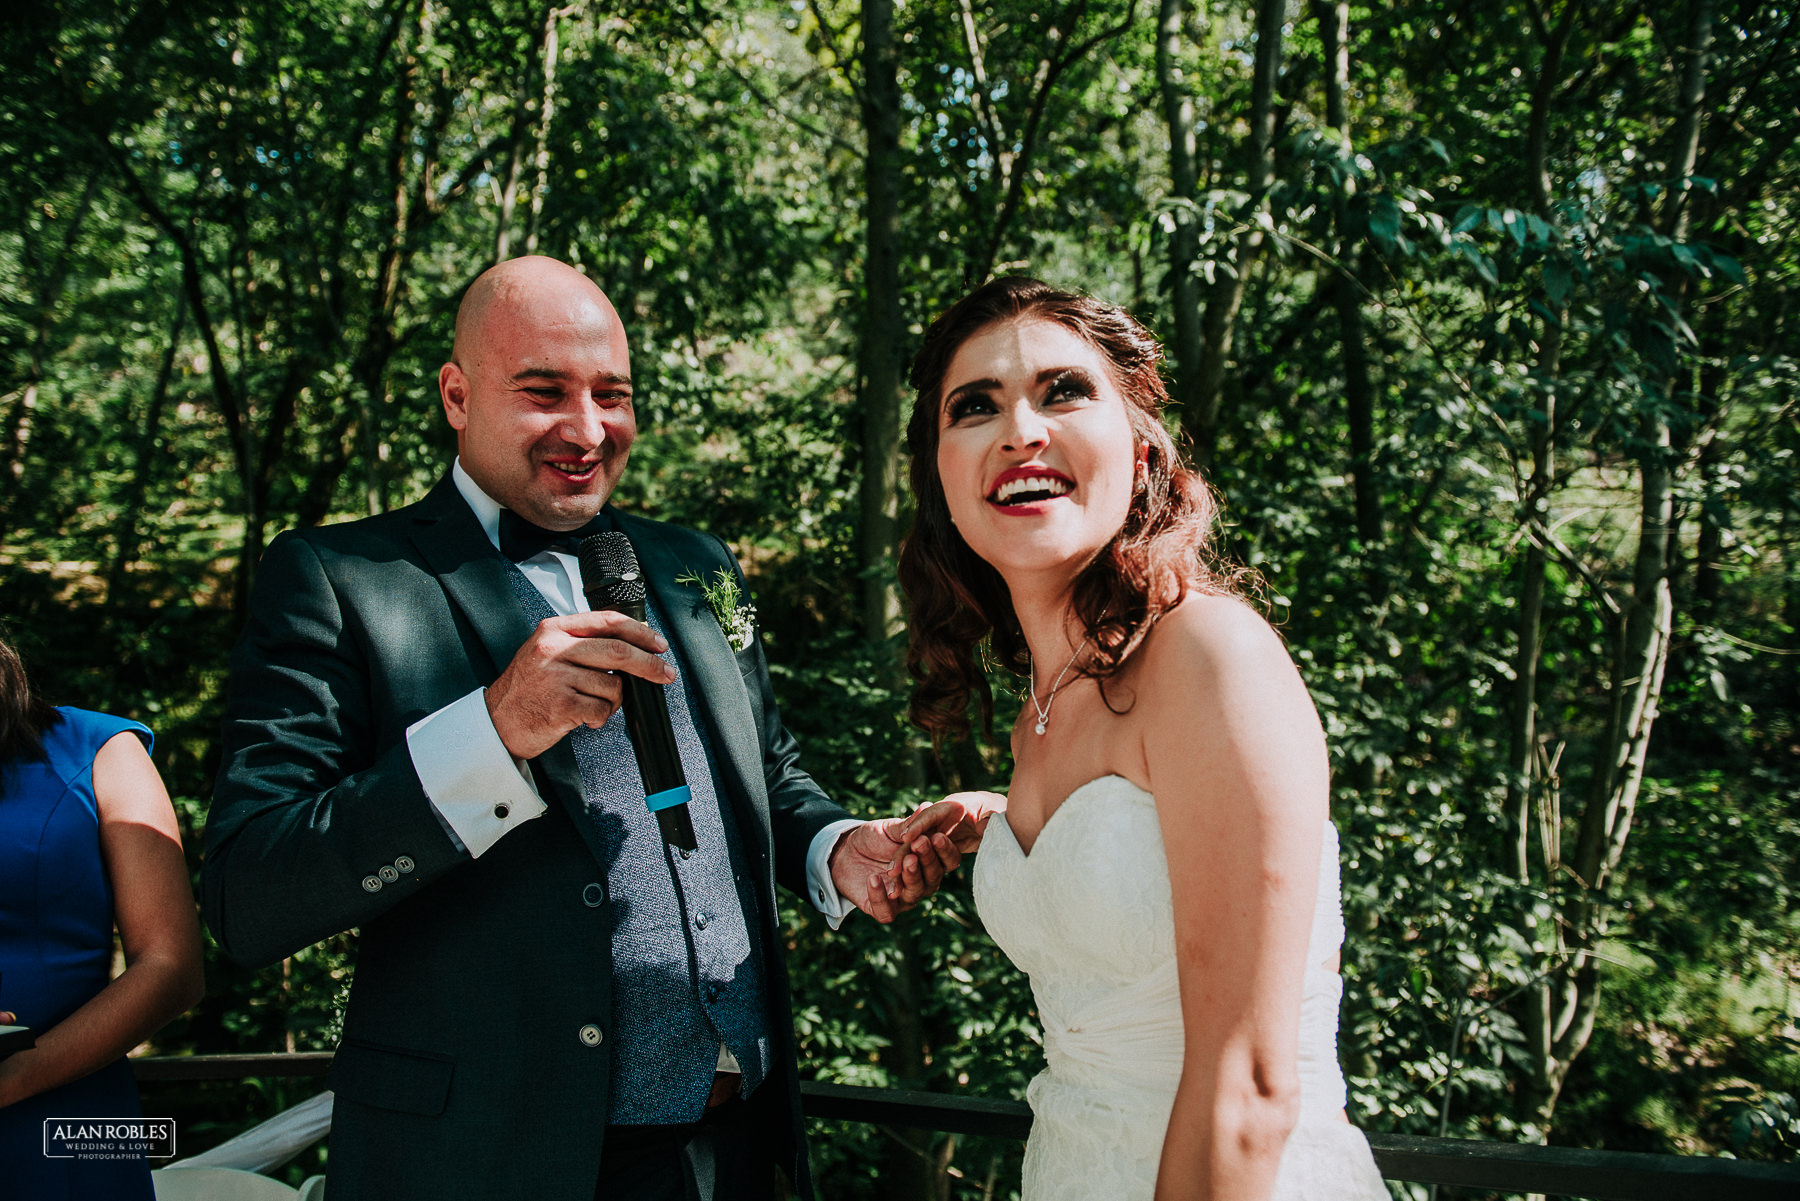 Fotografo de bodas guadalajara Alan Robles - Pinare terraza bistro 41